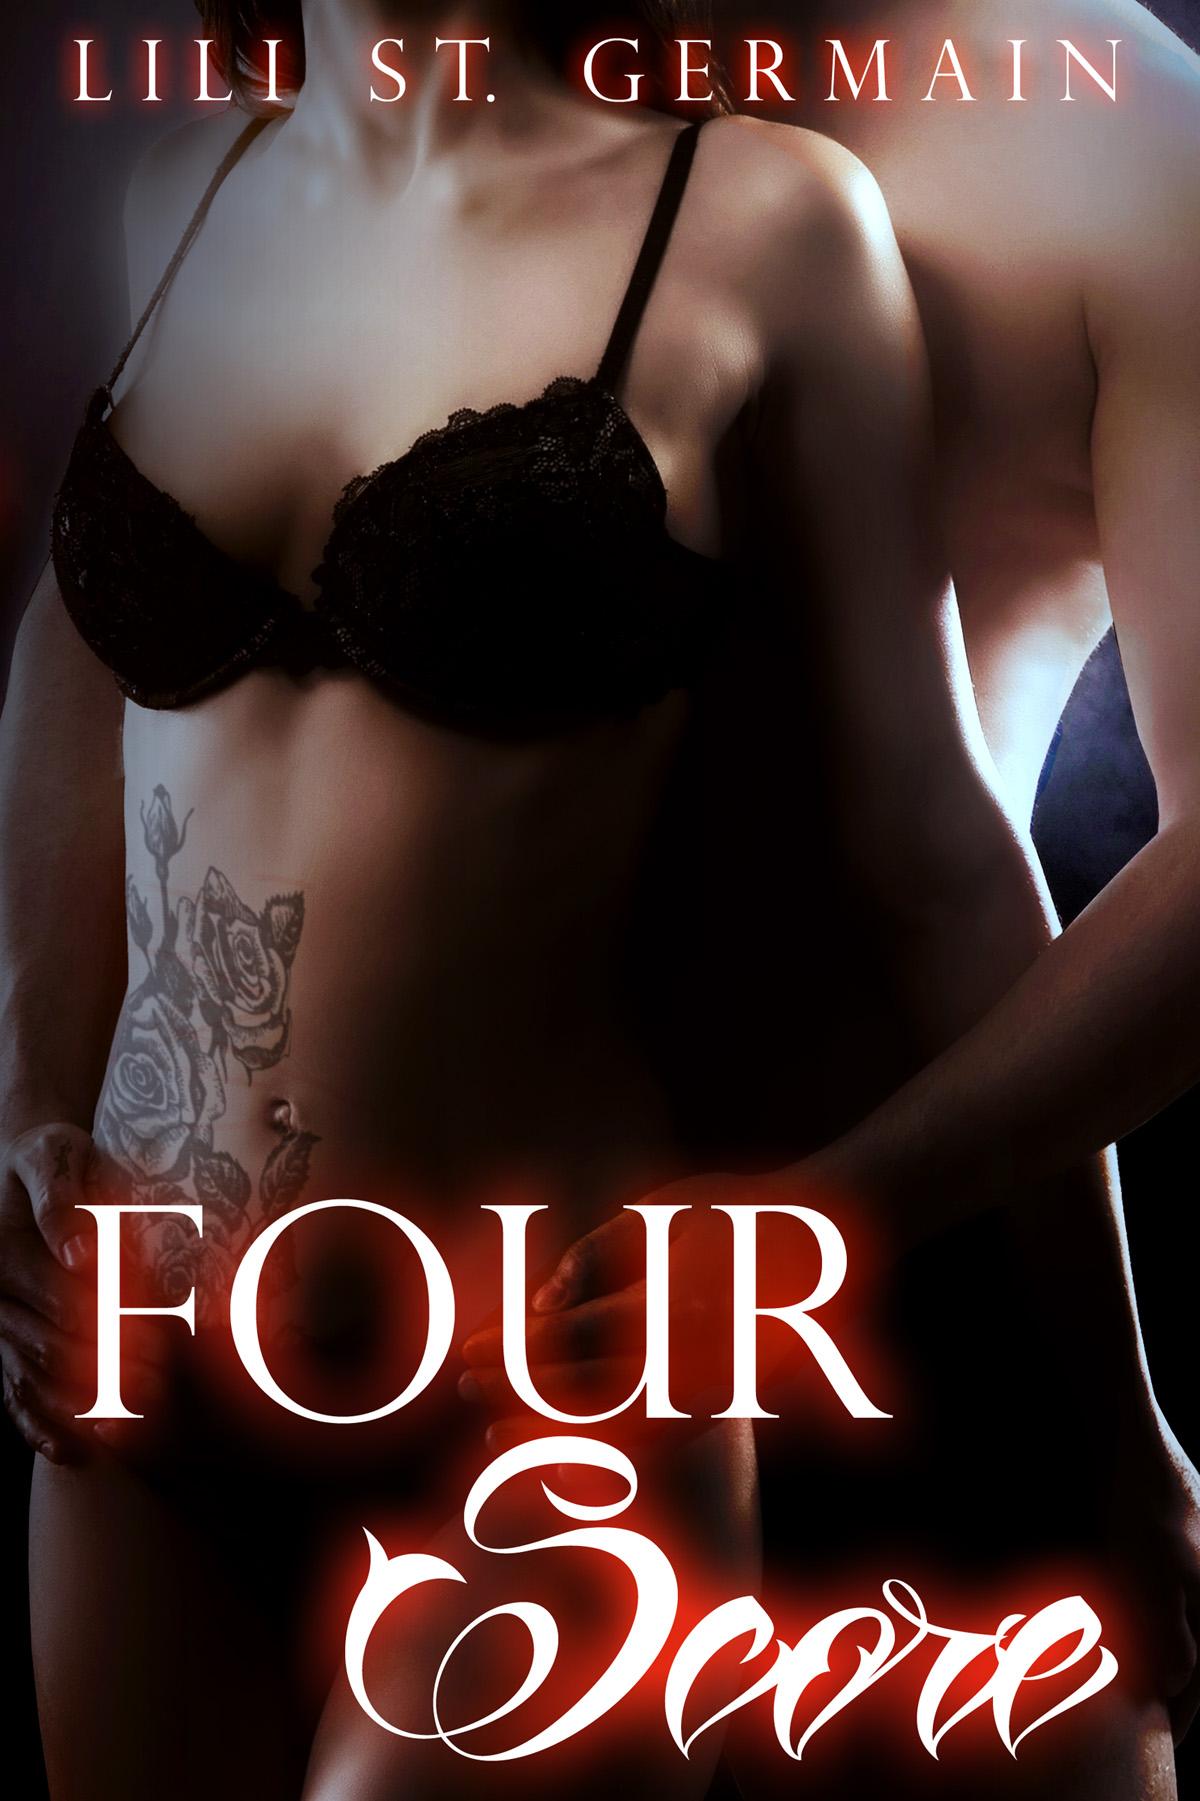 Four Score